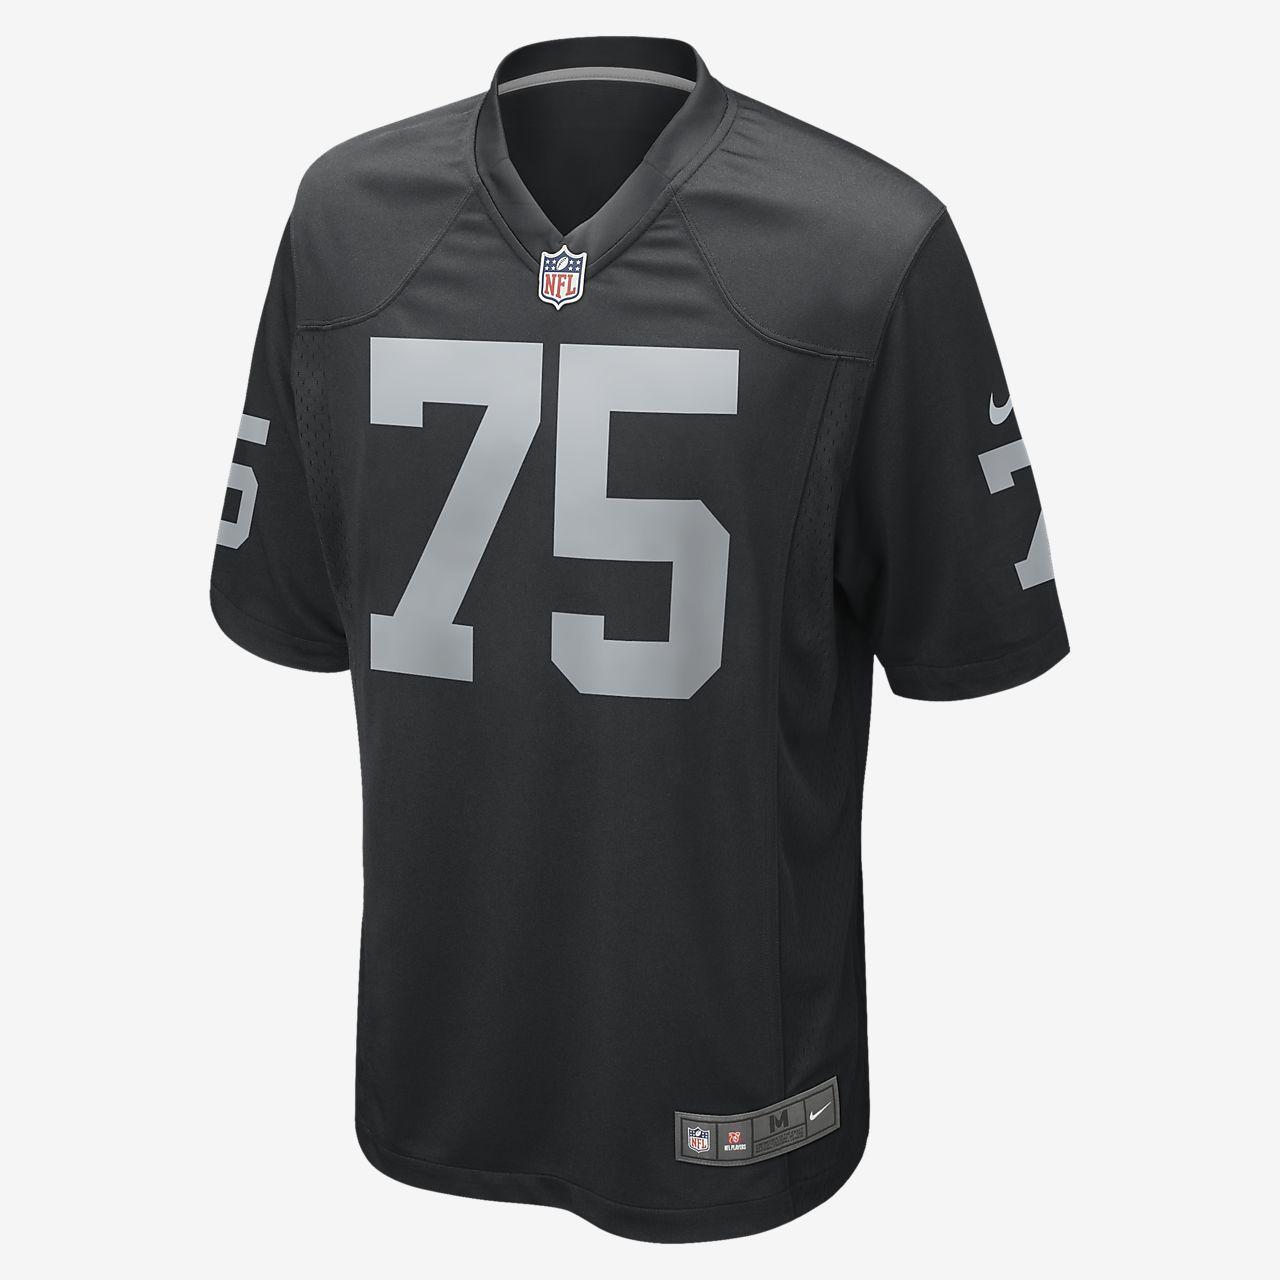 NFL Oakland Raiders Game Jersey (Khalil Mack) 468964-034 Black